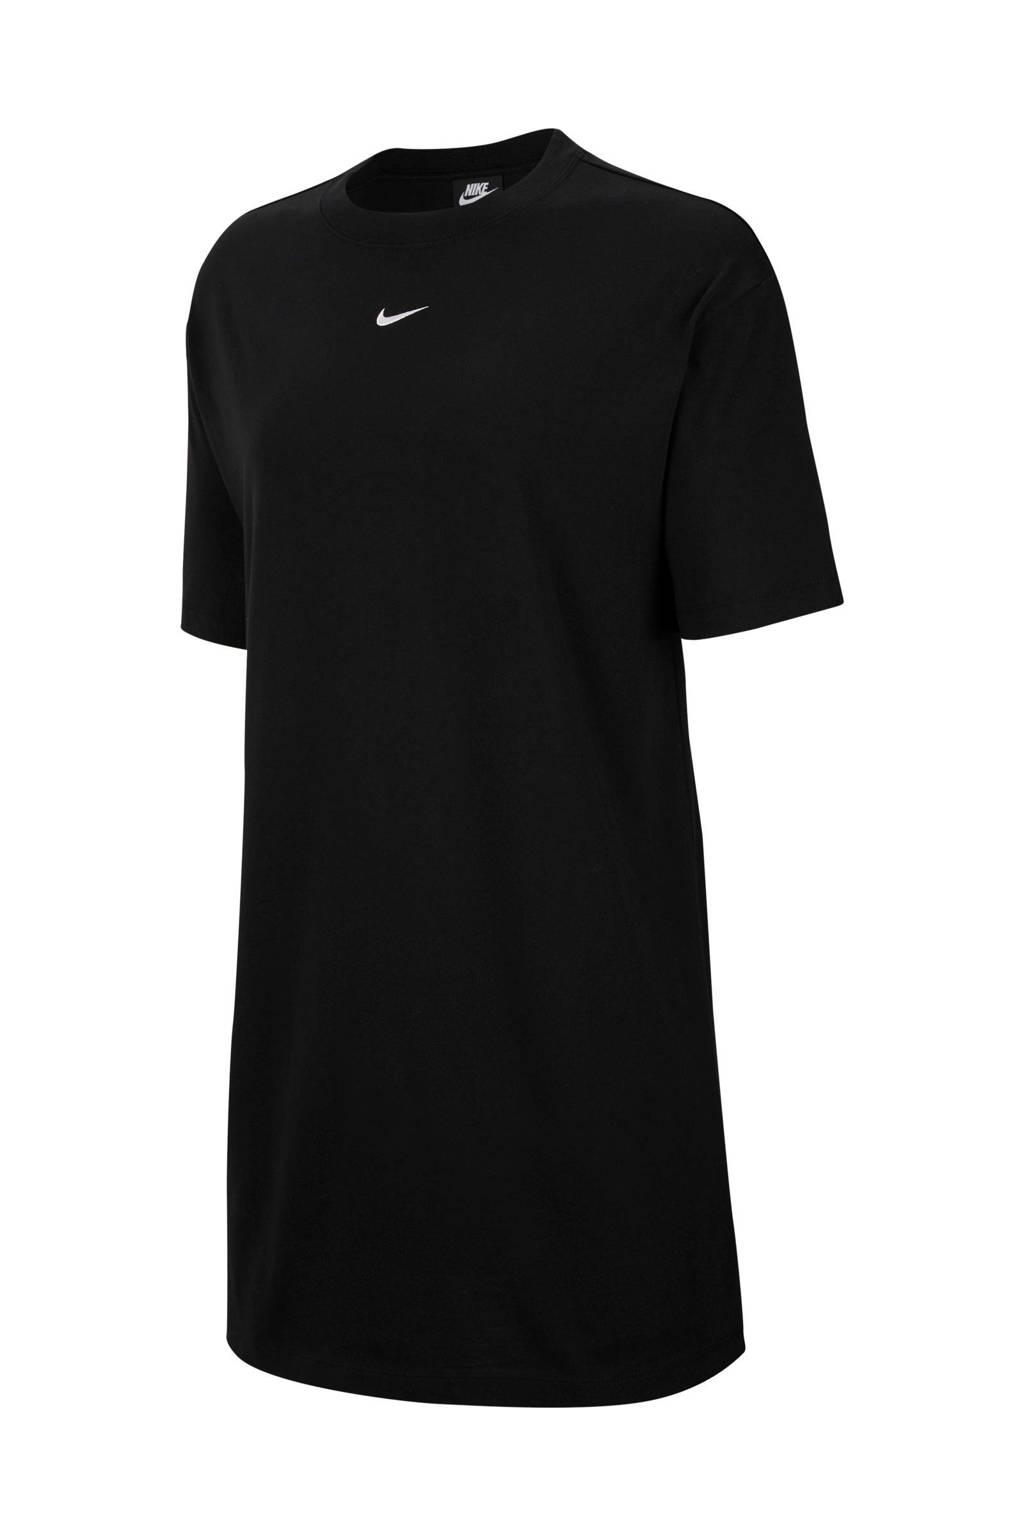 Nike sportjurk zwart, Zwart